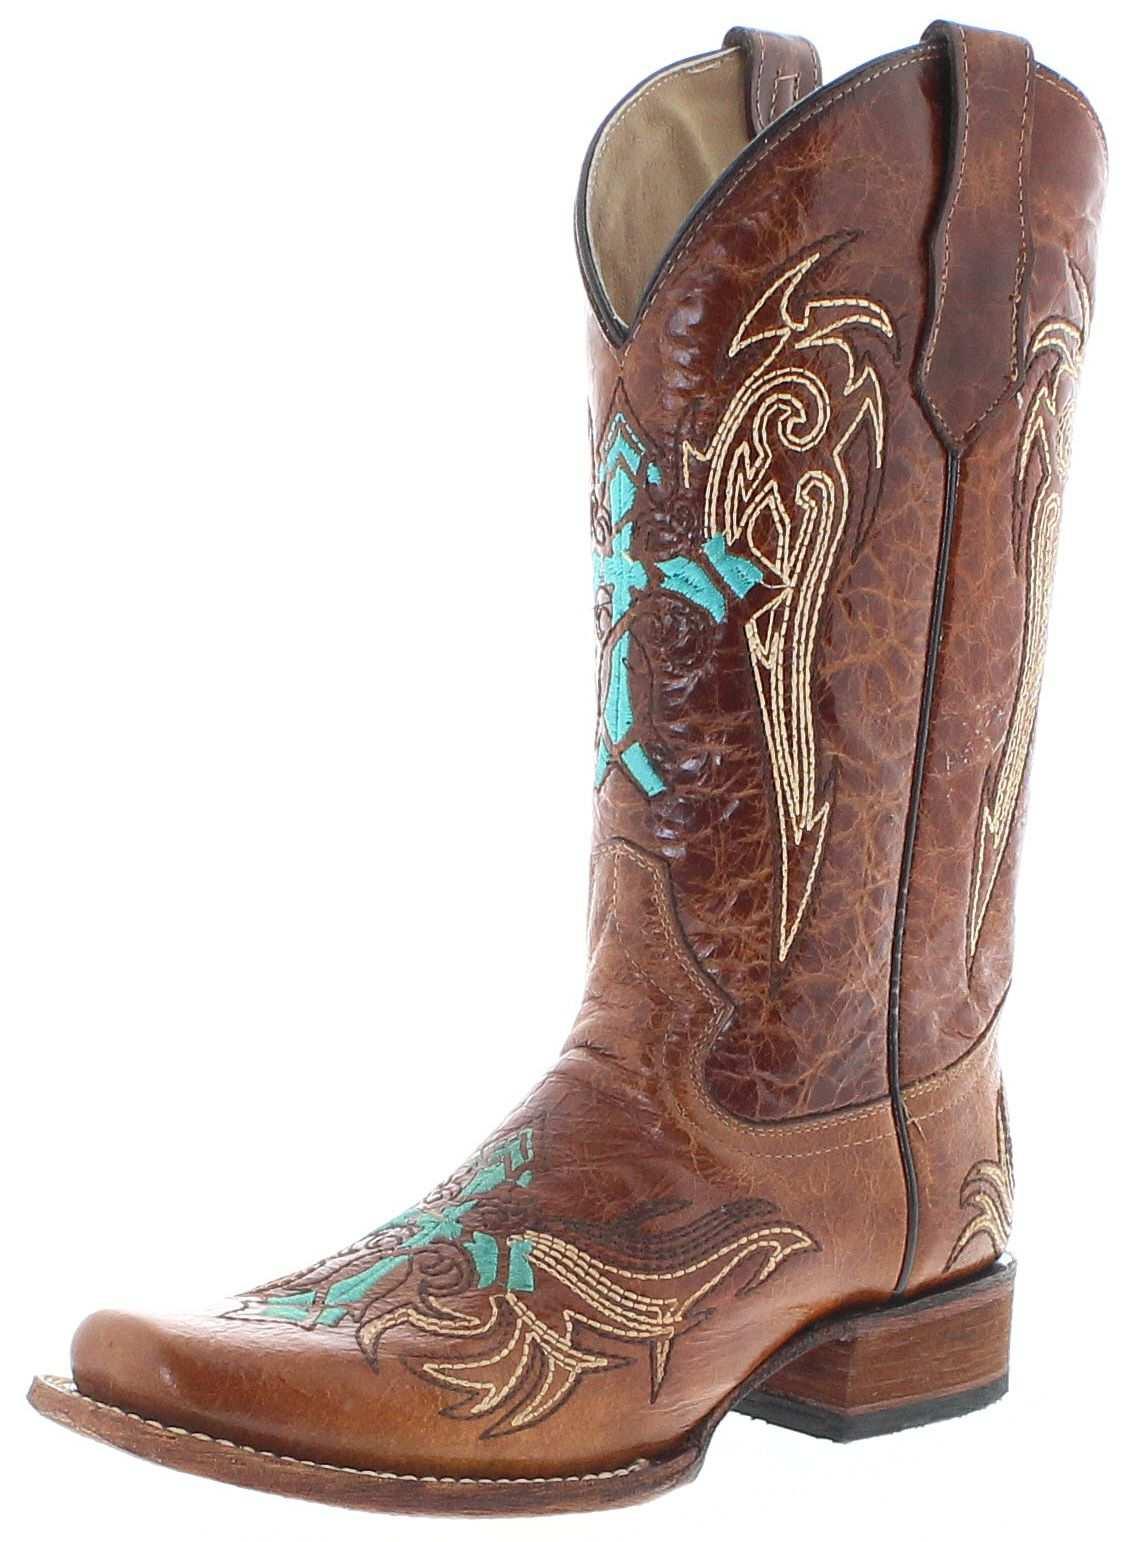 Circle G Boots L5463 Honey Turquoise Damen Westernstiefel Braun Fashion Boots